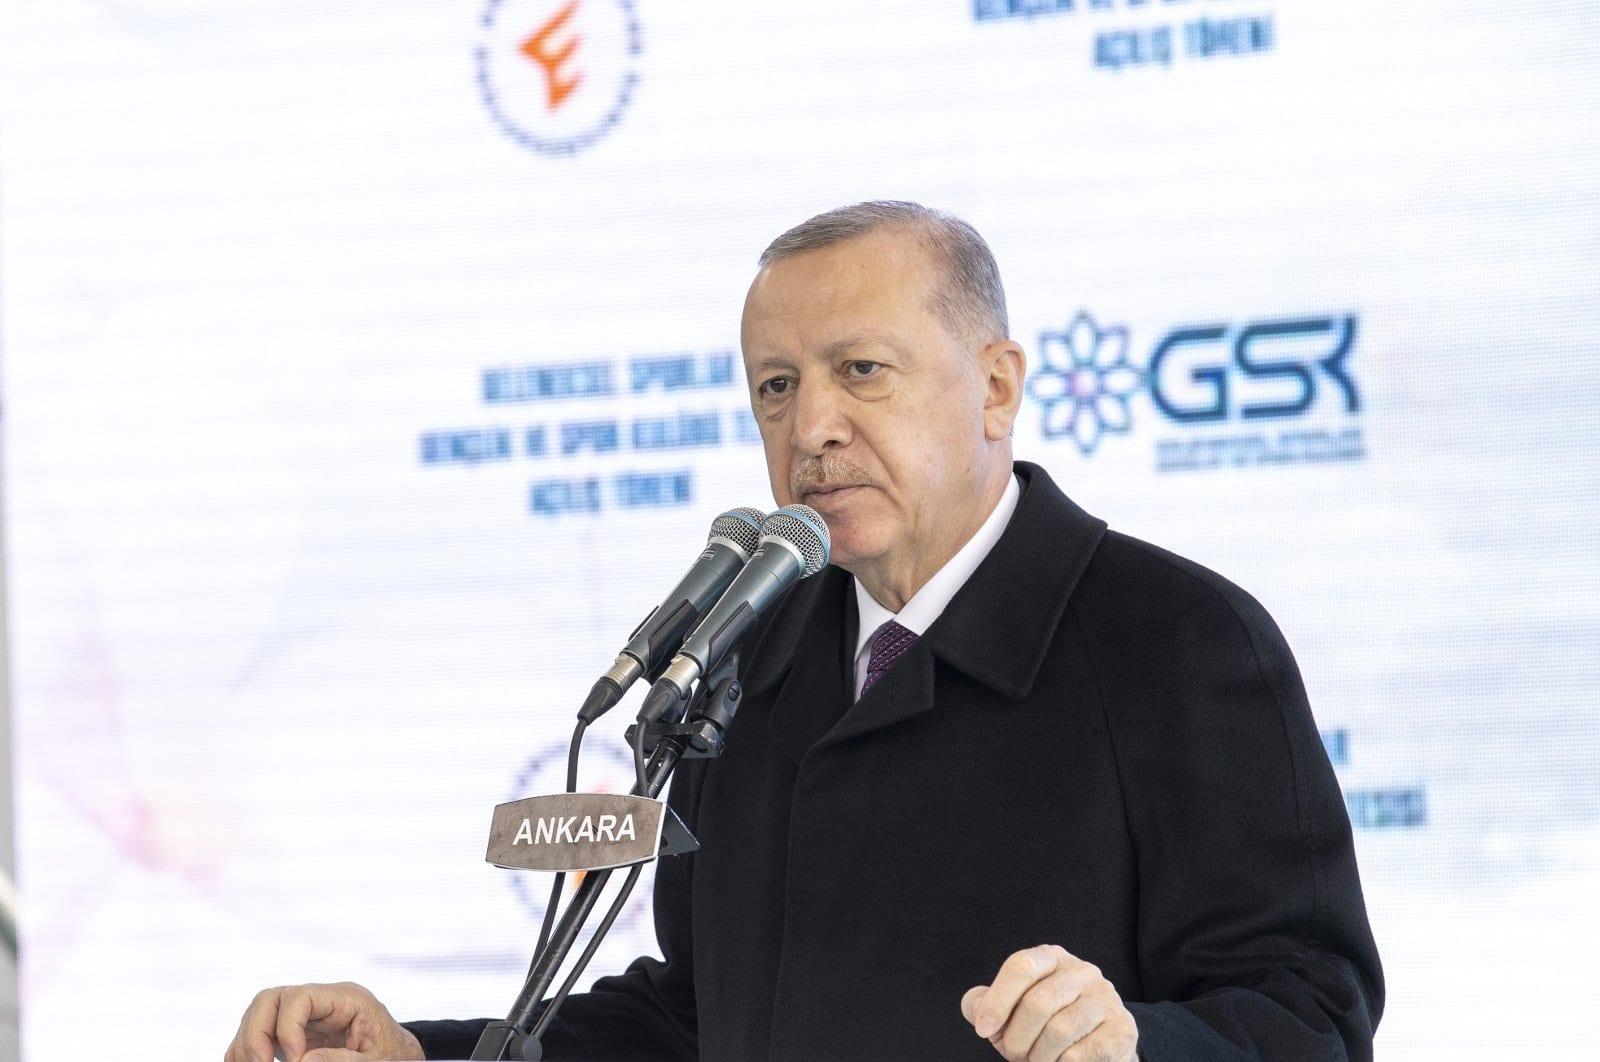 Turkey's President Erdoğan shares 1st message on Telegram